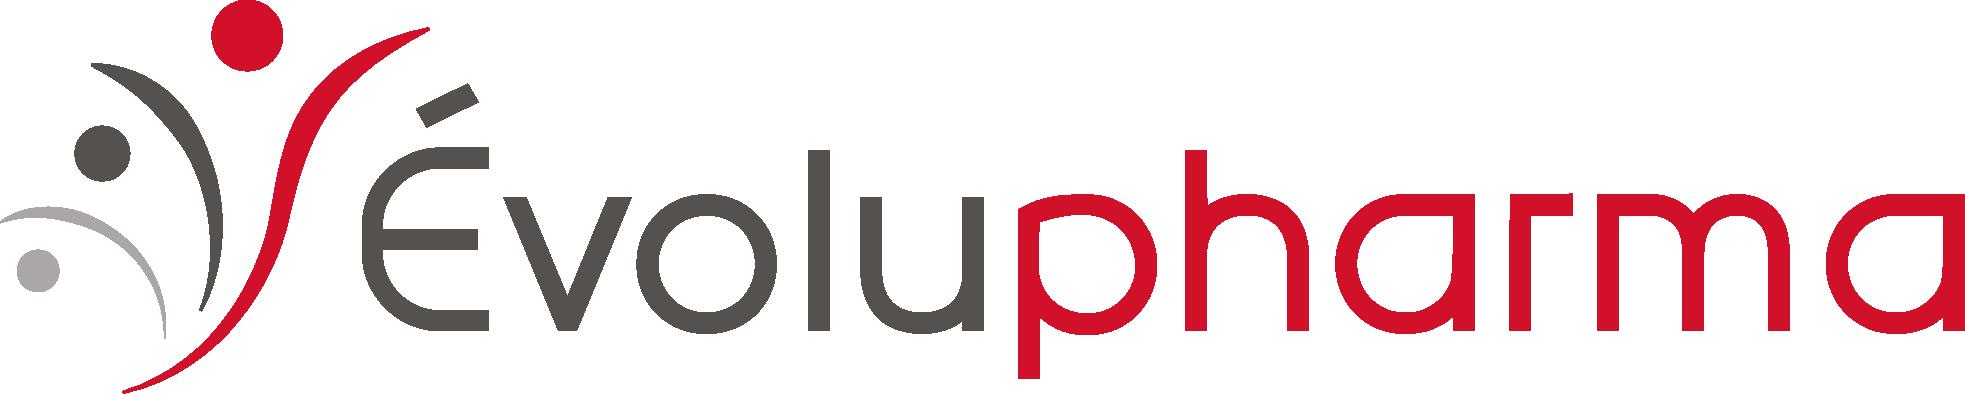 Logo-Evolupharma-gris.png